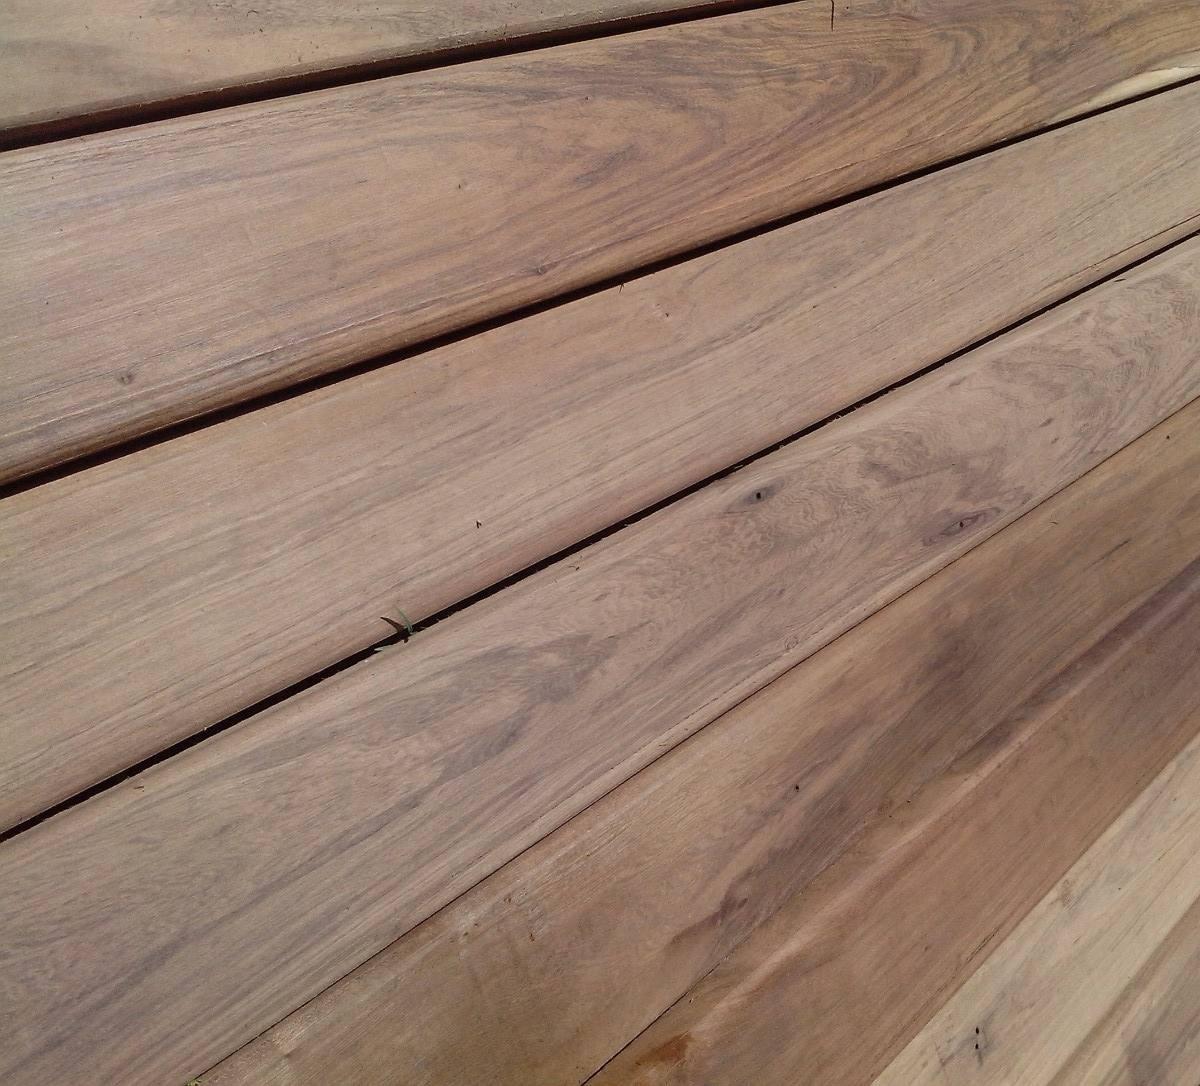 Venta de maderas importadas - virapita